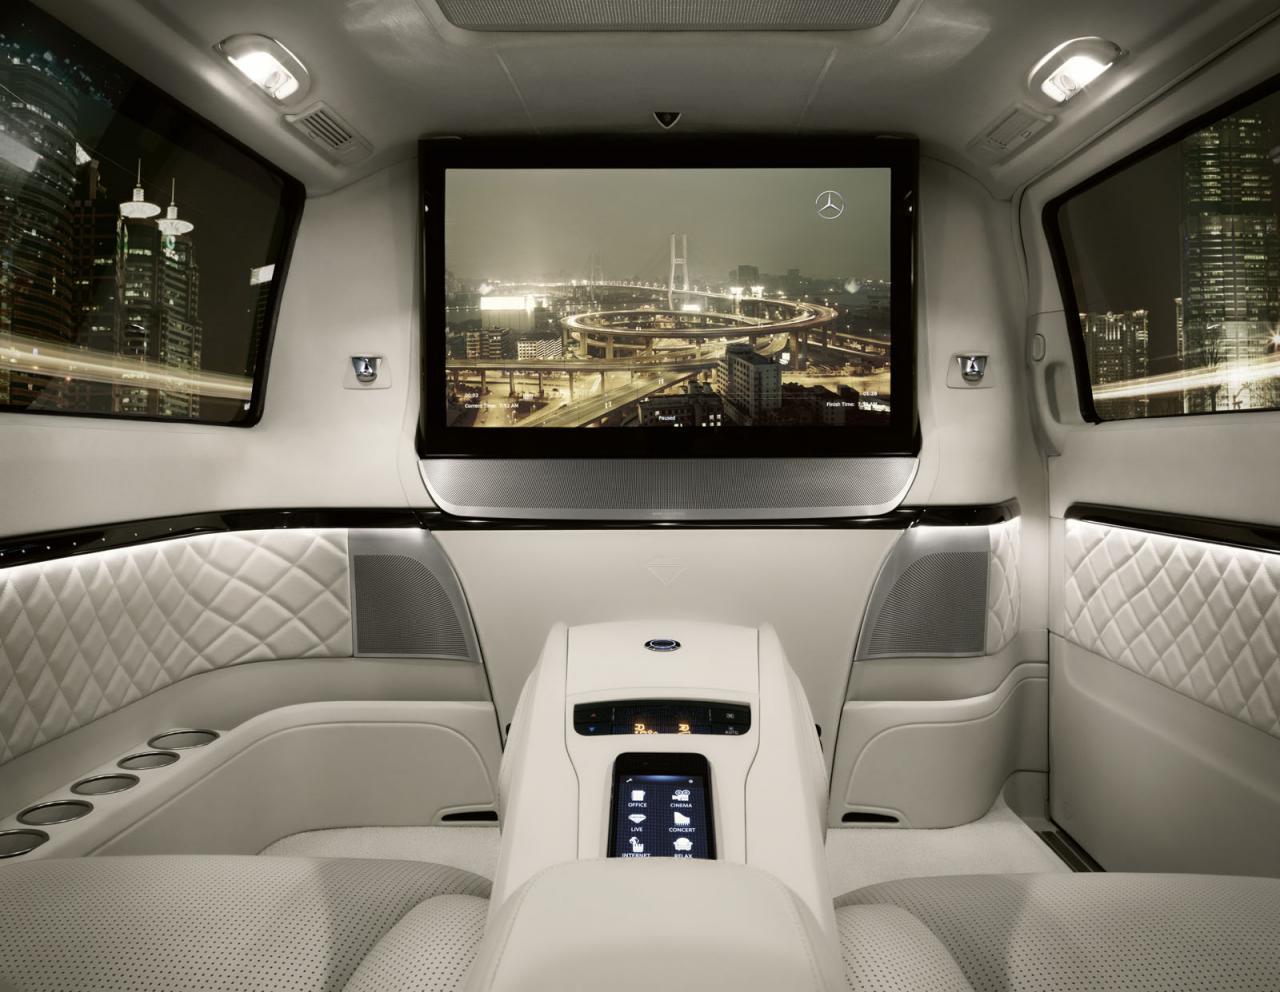 p kin 2012 mercedes d voile le viano vision diamond. Black Bedroom Furniture Sets. Home Design Ideas